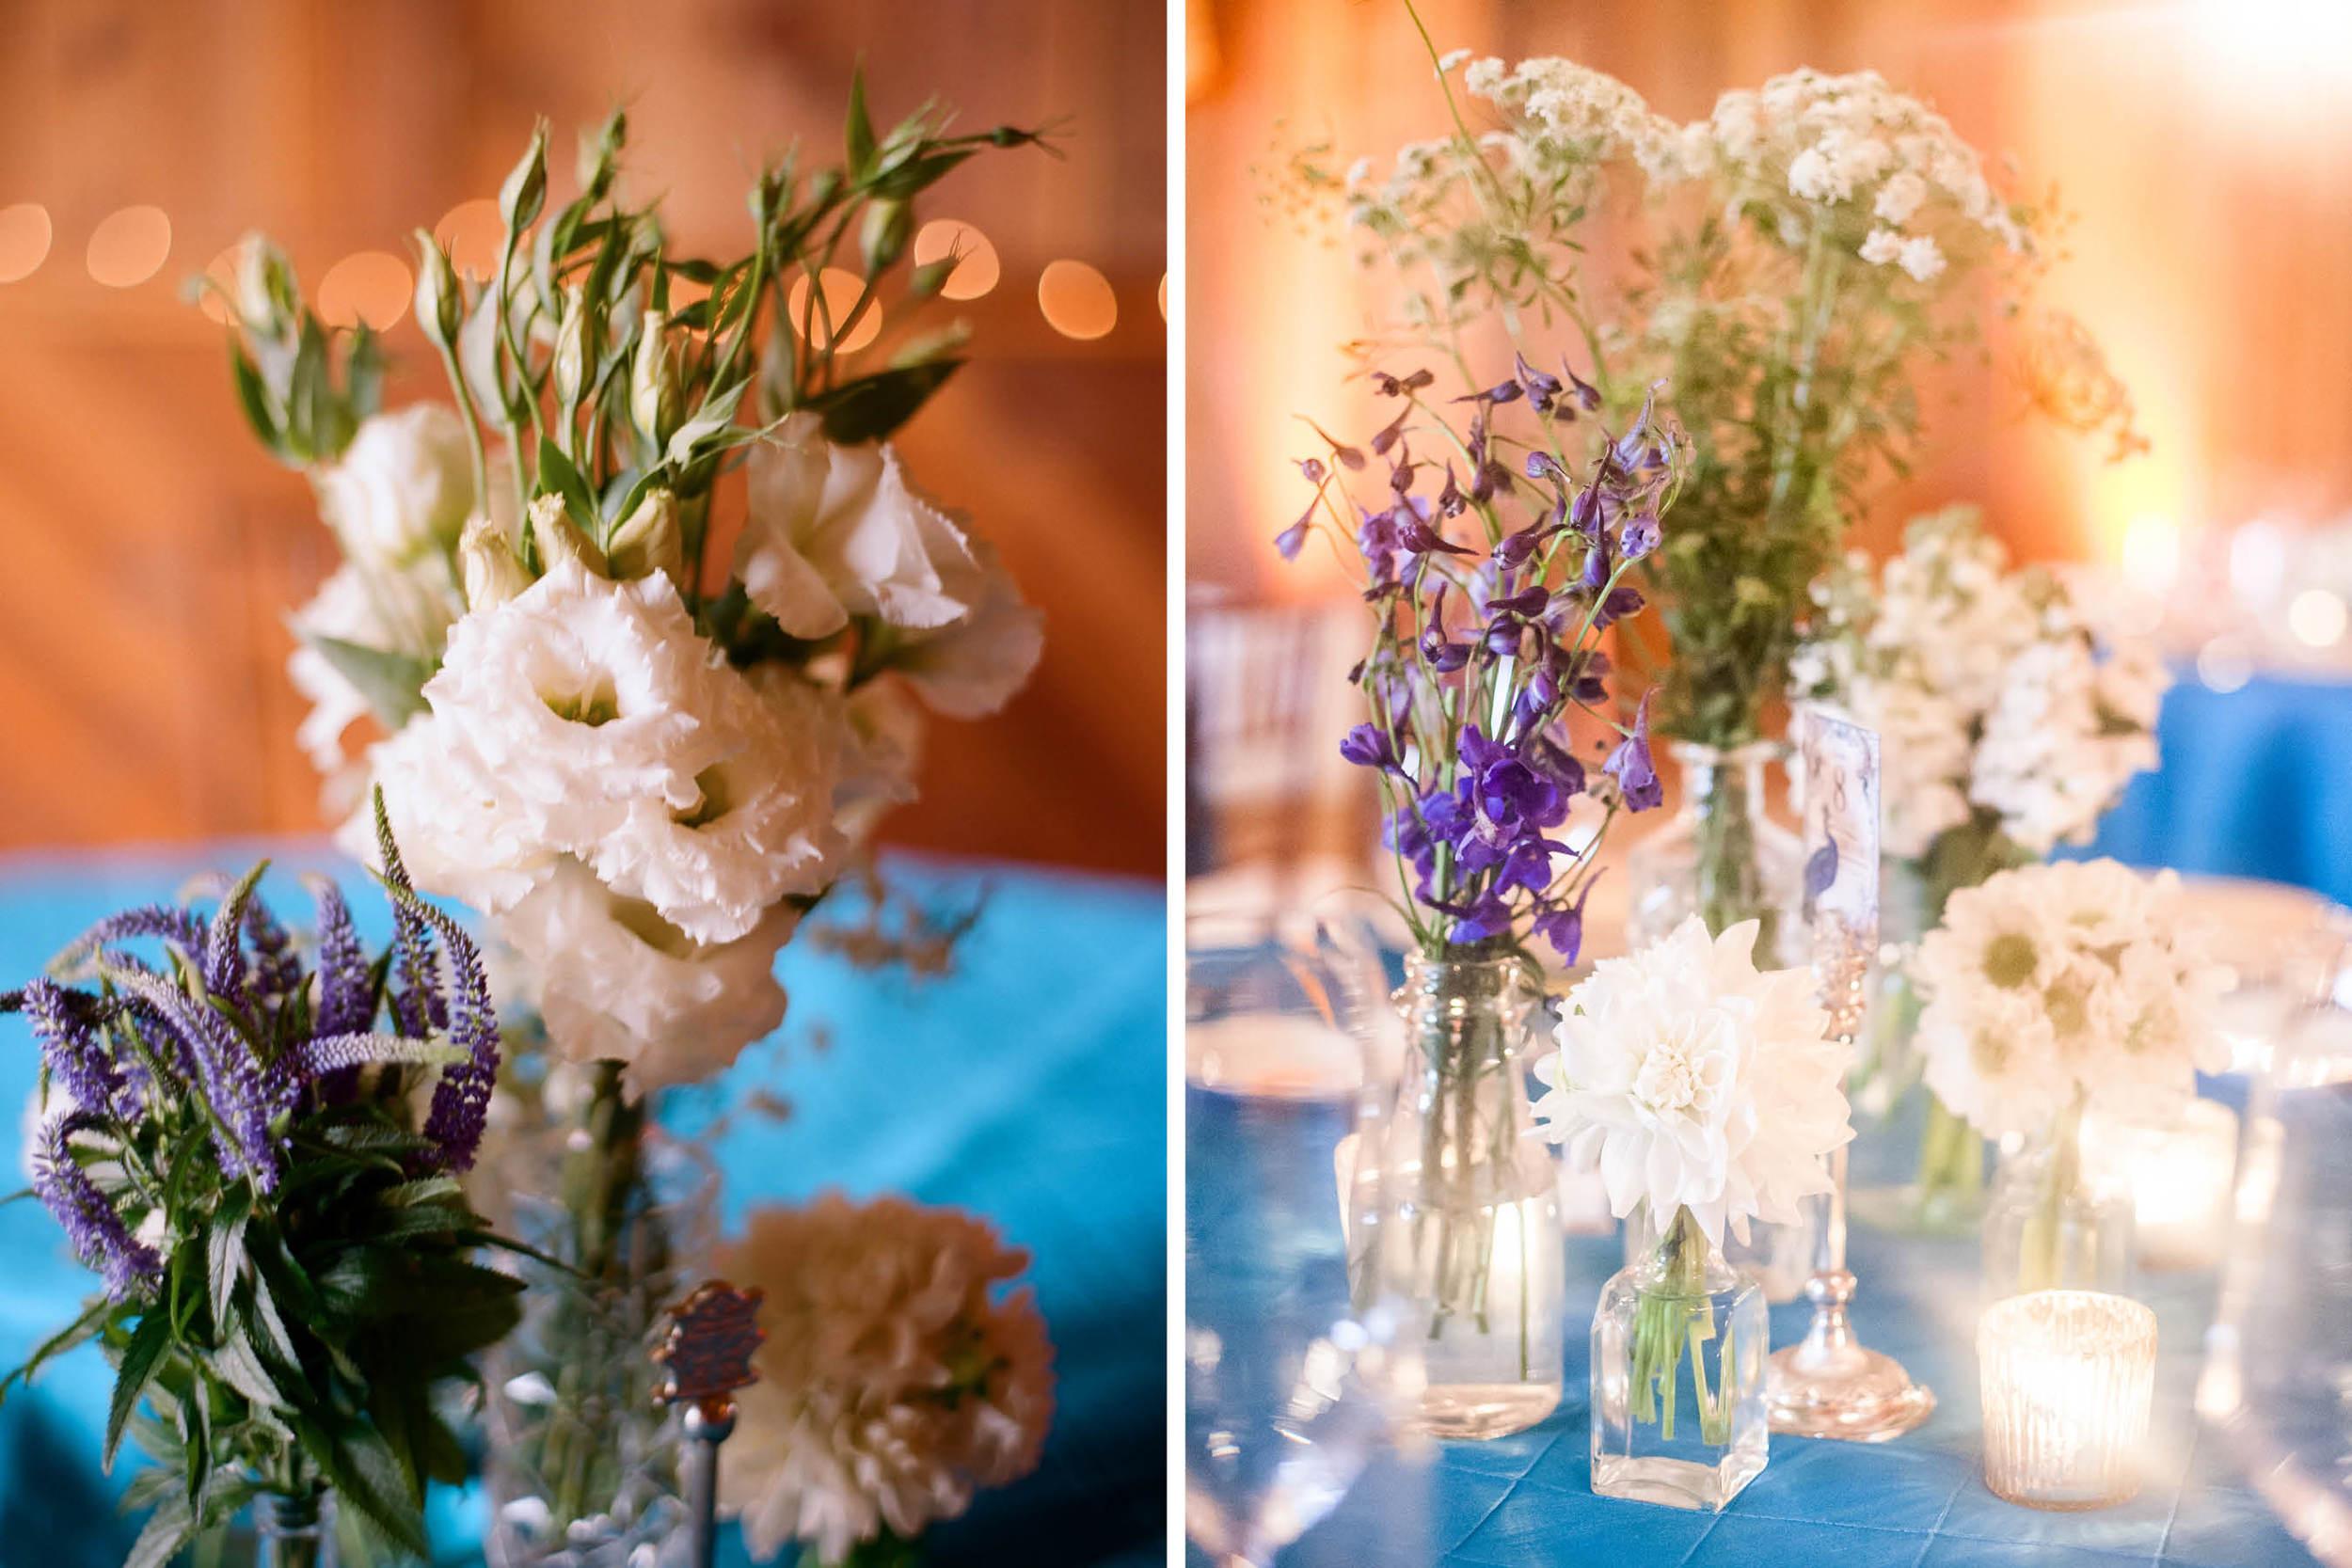 tres-hermanas-winery-vineyard-wedding-planner-coordinator-santa-barbara-ynez-maria (17).jpg